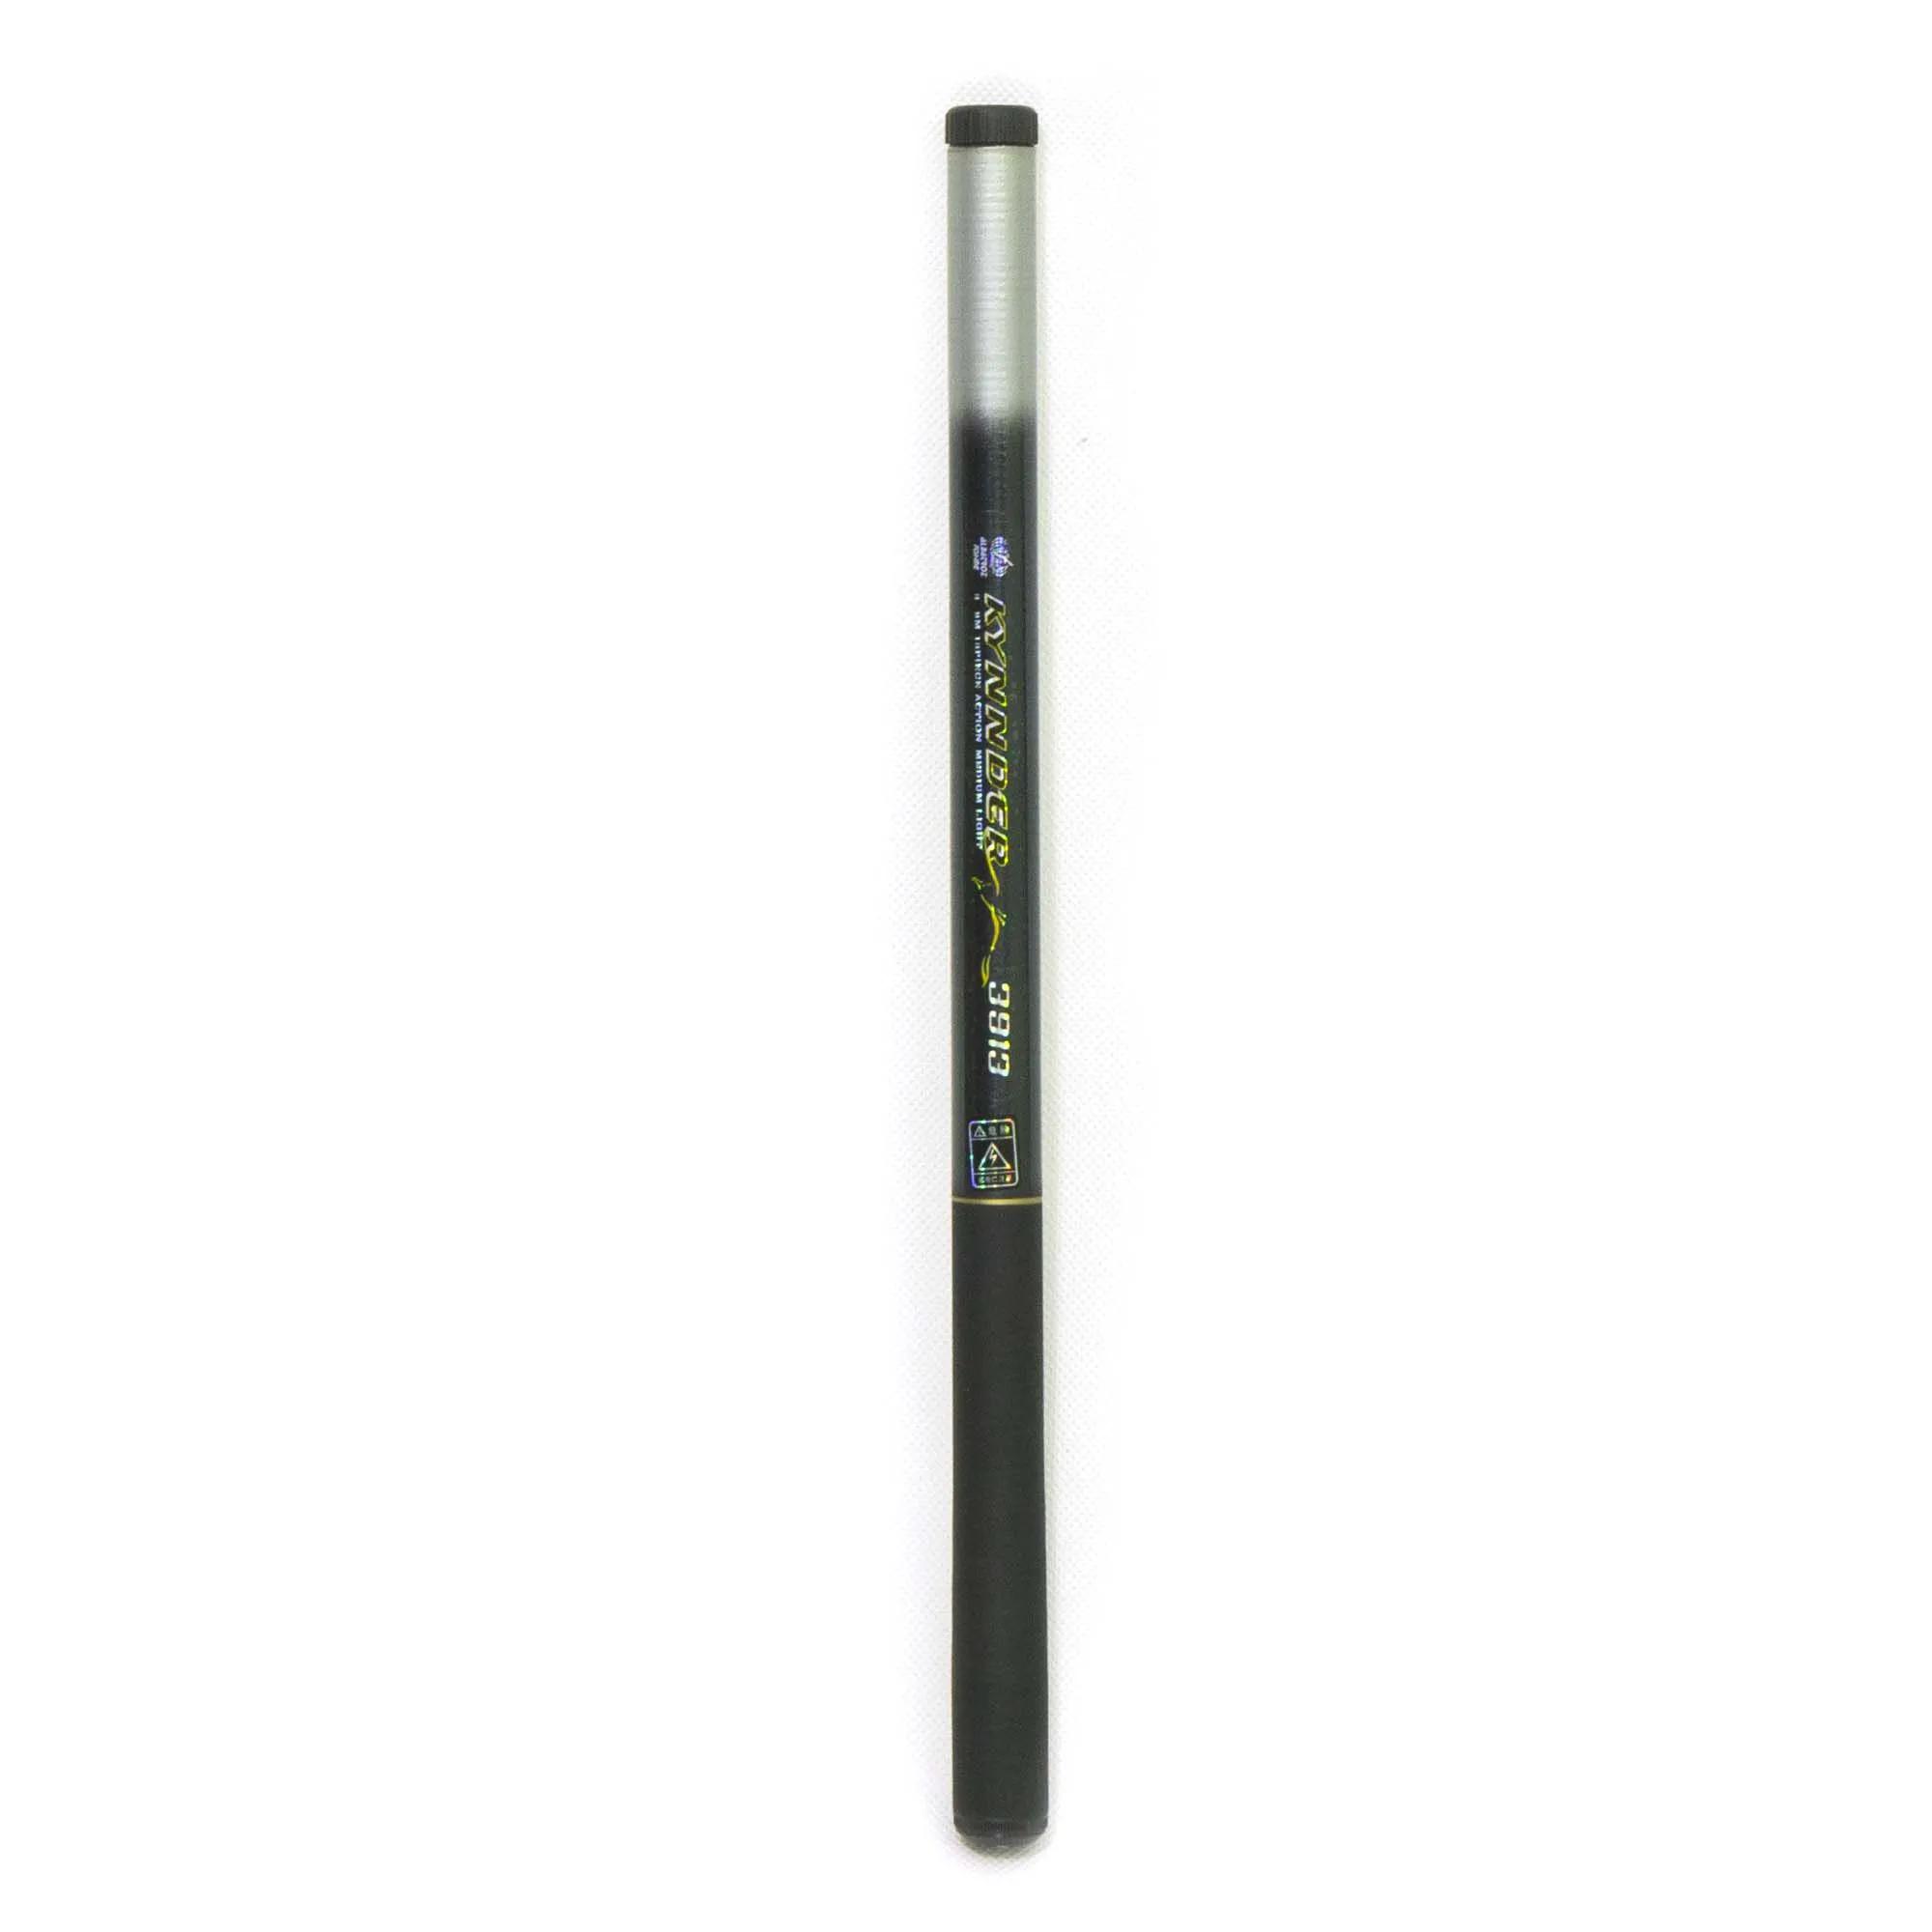 Vara Telescópica uso sem Molinete Kynnder 45% Carbono 2,70m - 9P  - Artpesca